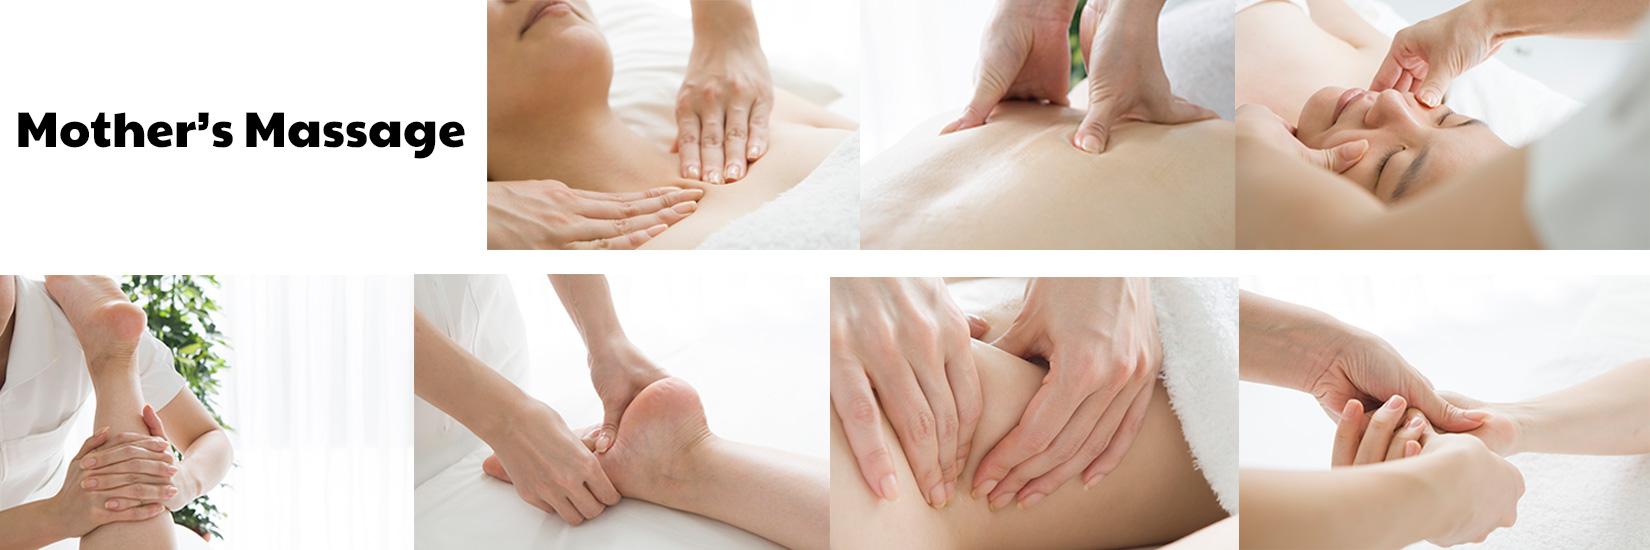 Mothers-Massage-Cucciku